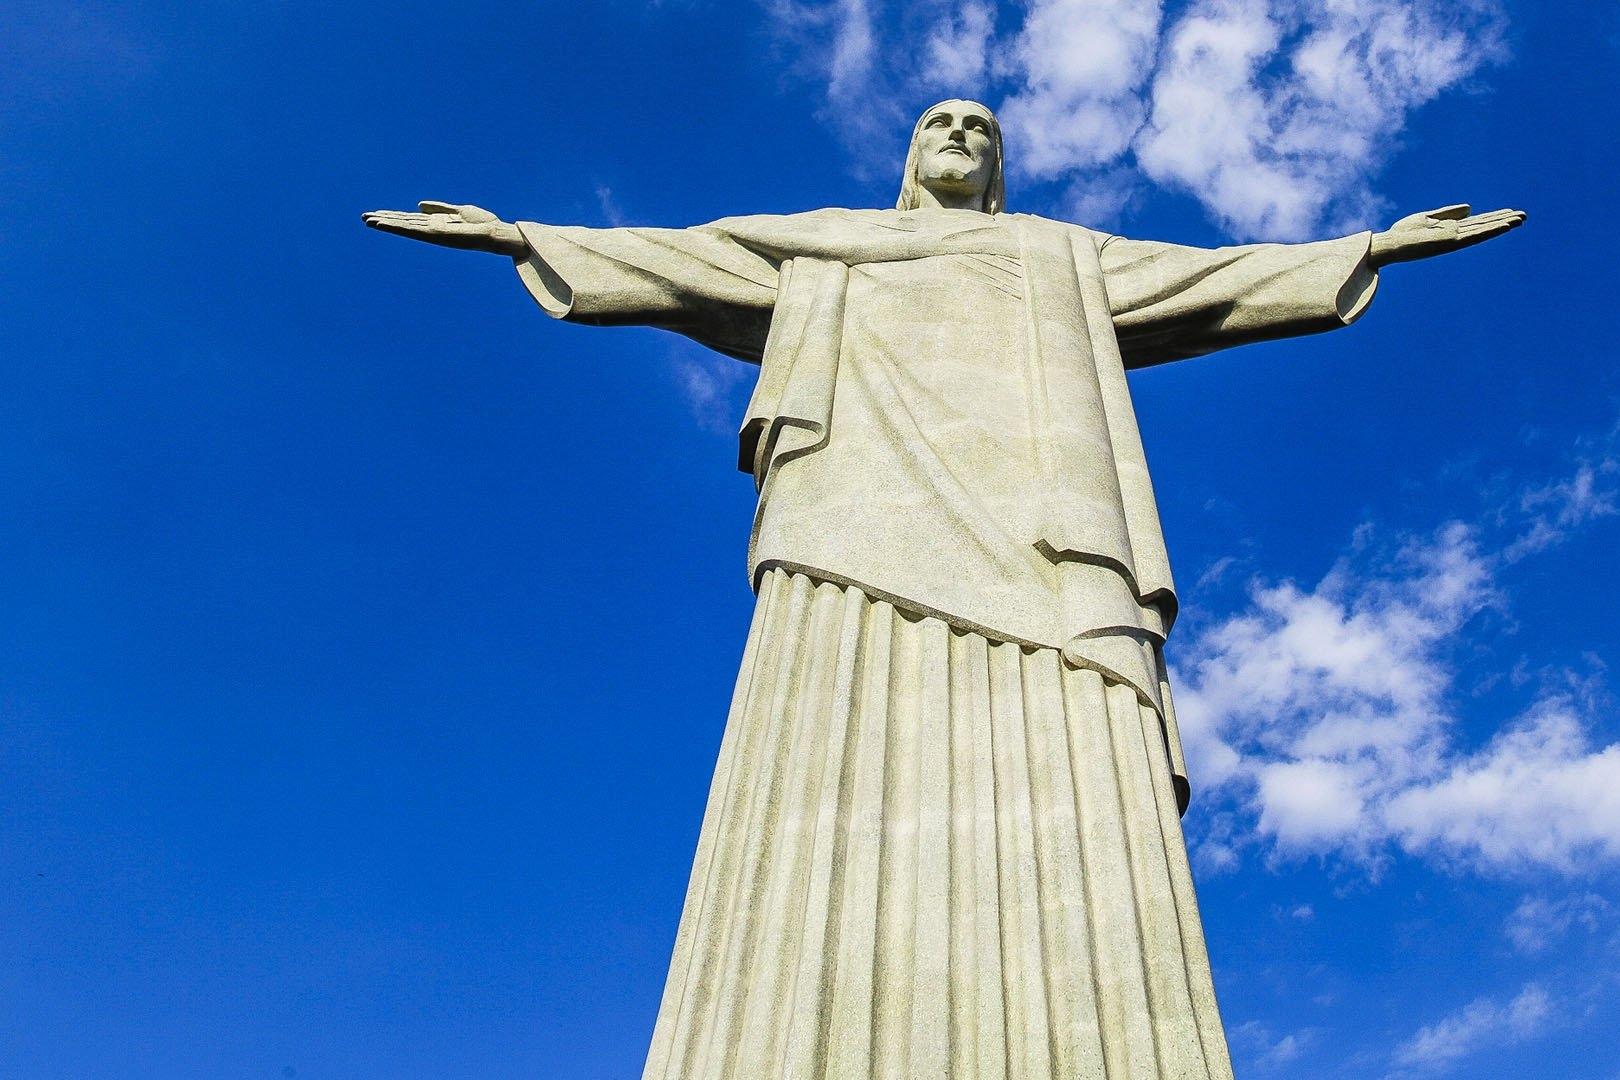 Christ_the_Redeemer_in_Rio-Desktop-Wallpapers.jpg